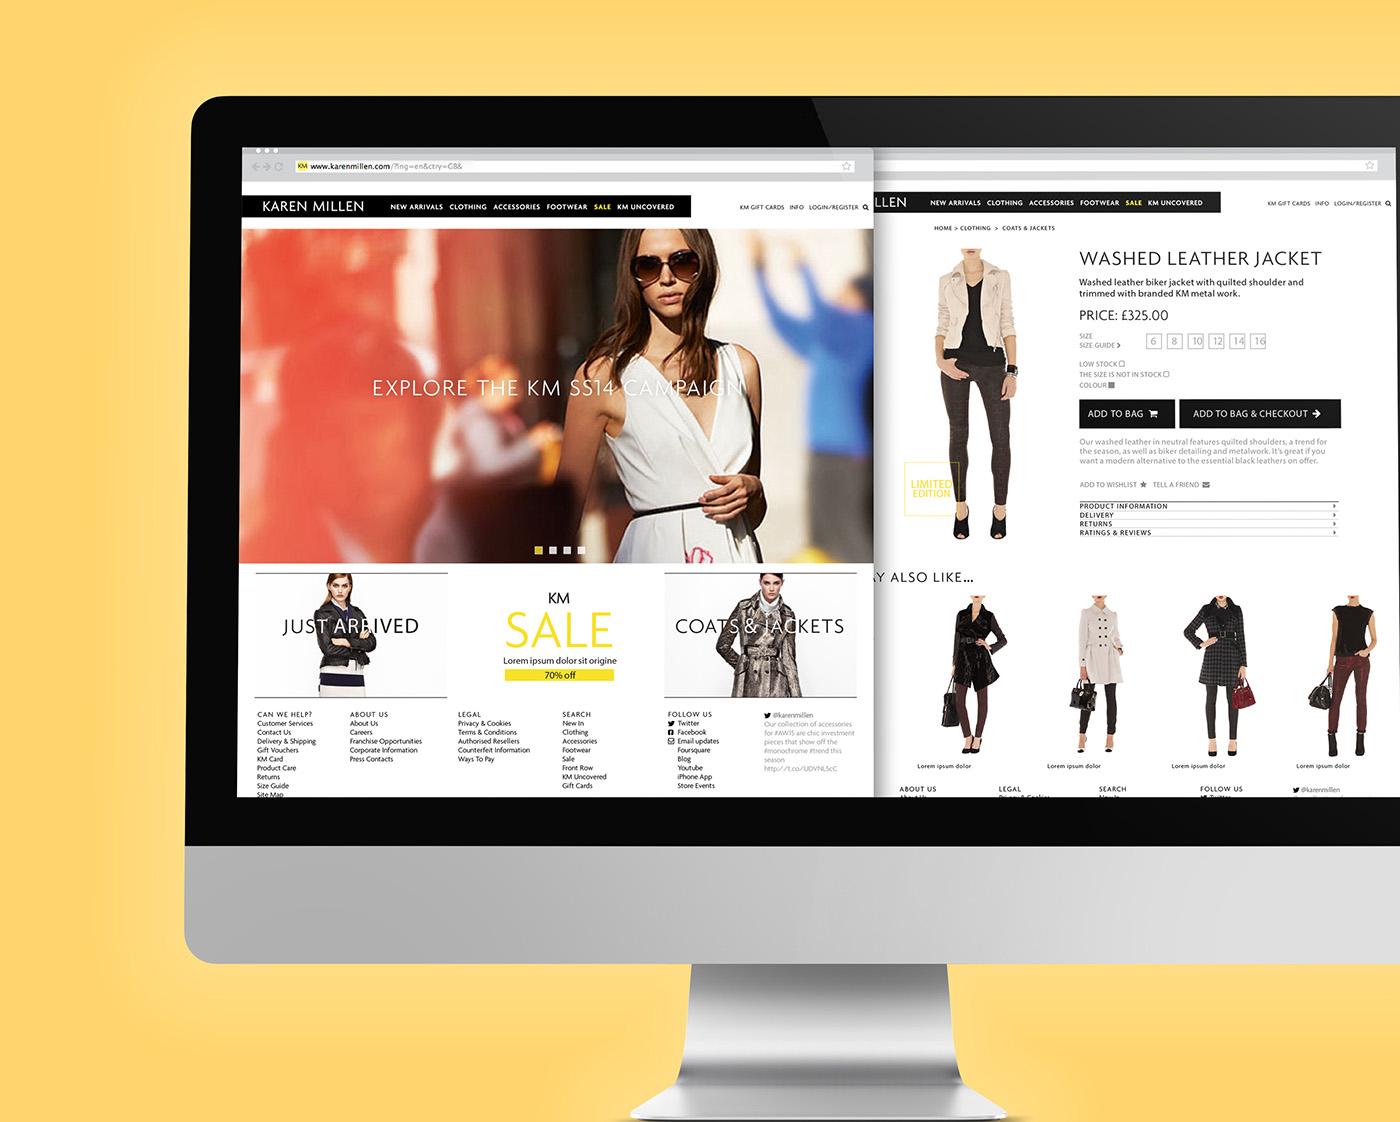 Karen Millen web design - reskin - design by Garrett Reil